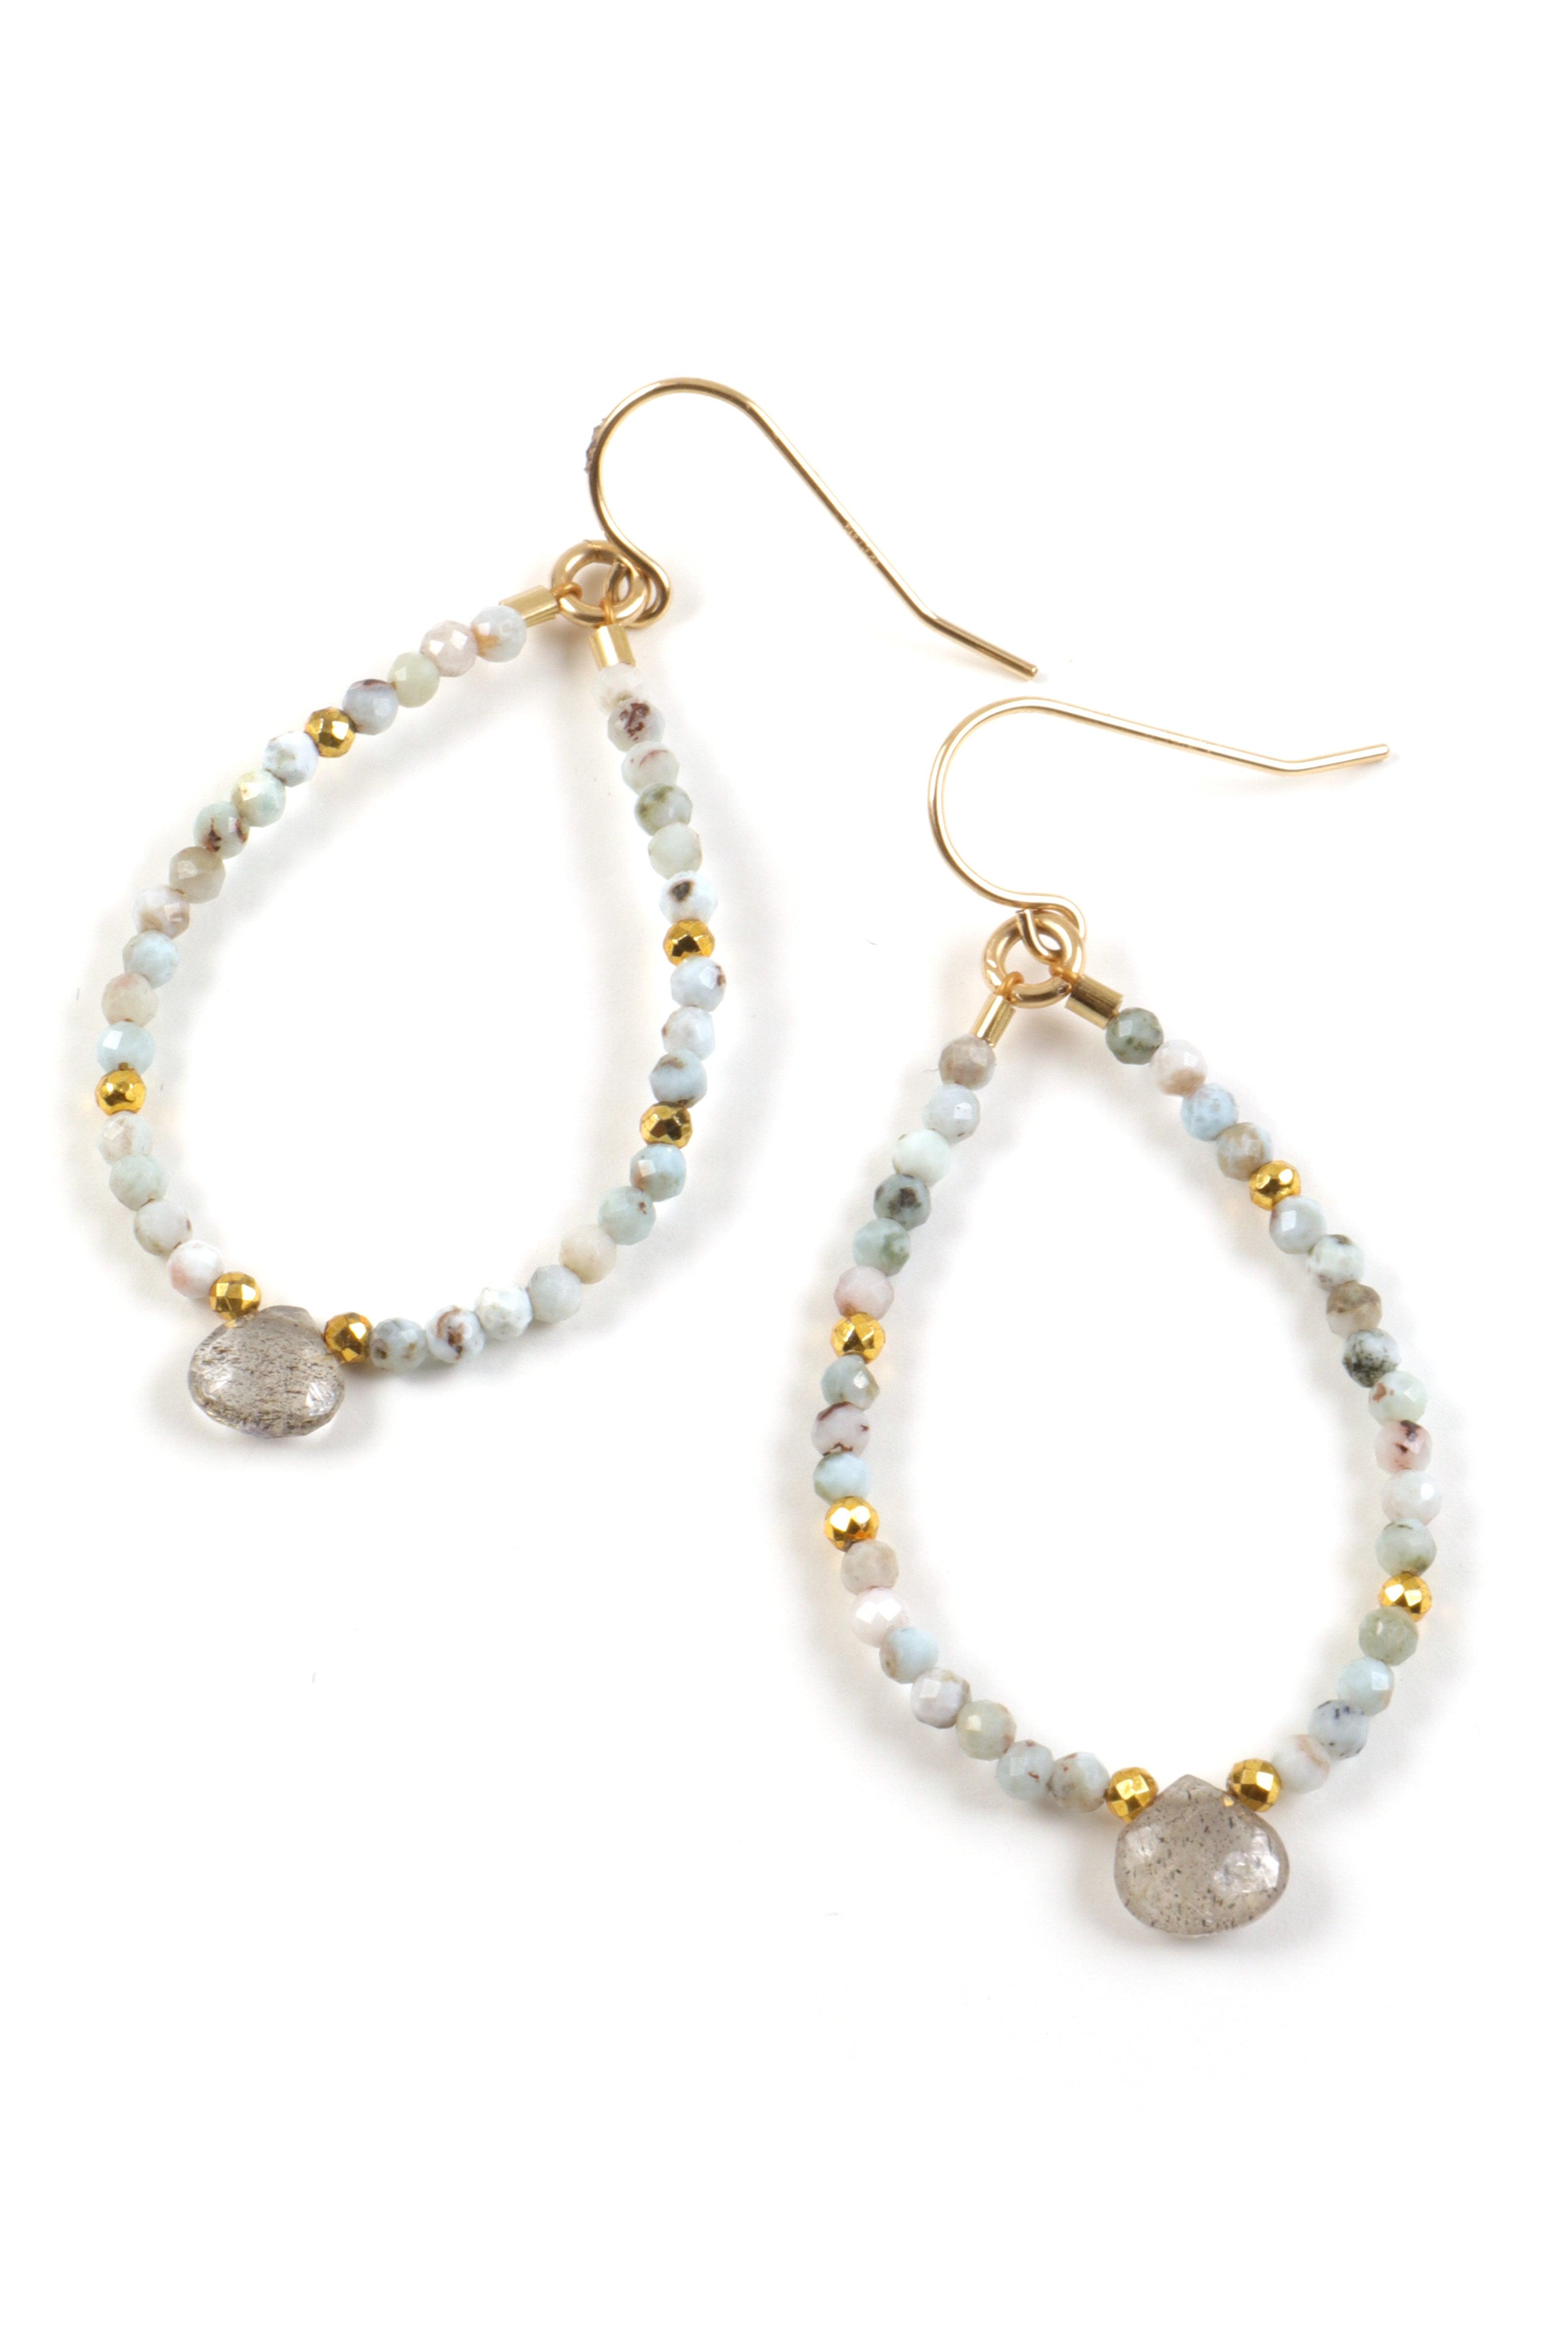 Mickey Lynn Jewelry Petite Larimar and Labradorite Beaded Hoops